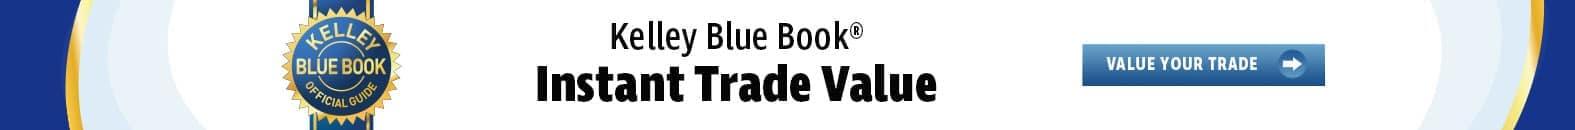 Kelley Blue Book Instant Trade Value - Bert Ogden Buick GMC in Edinburg, Texas